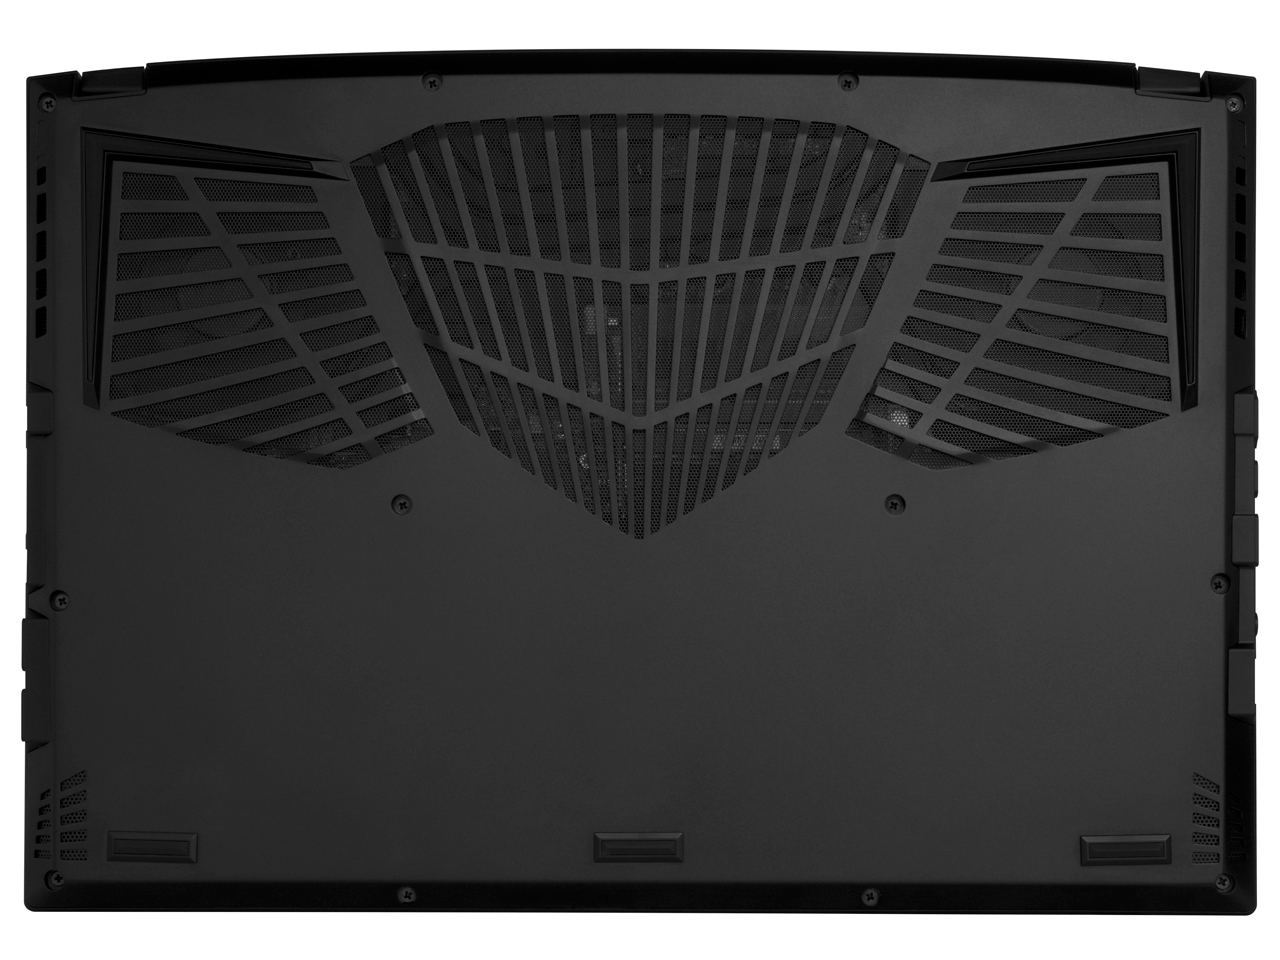 AERO 15 OLED XB-8JP51B0SP の製品画像